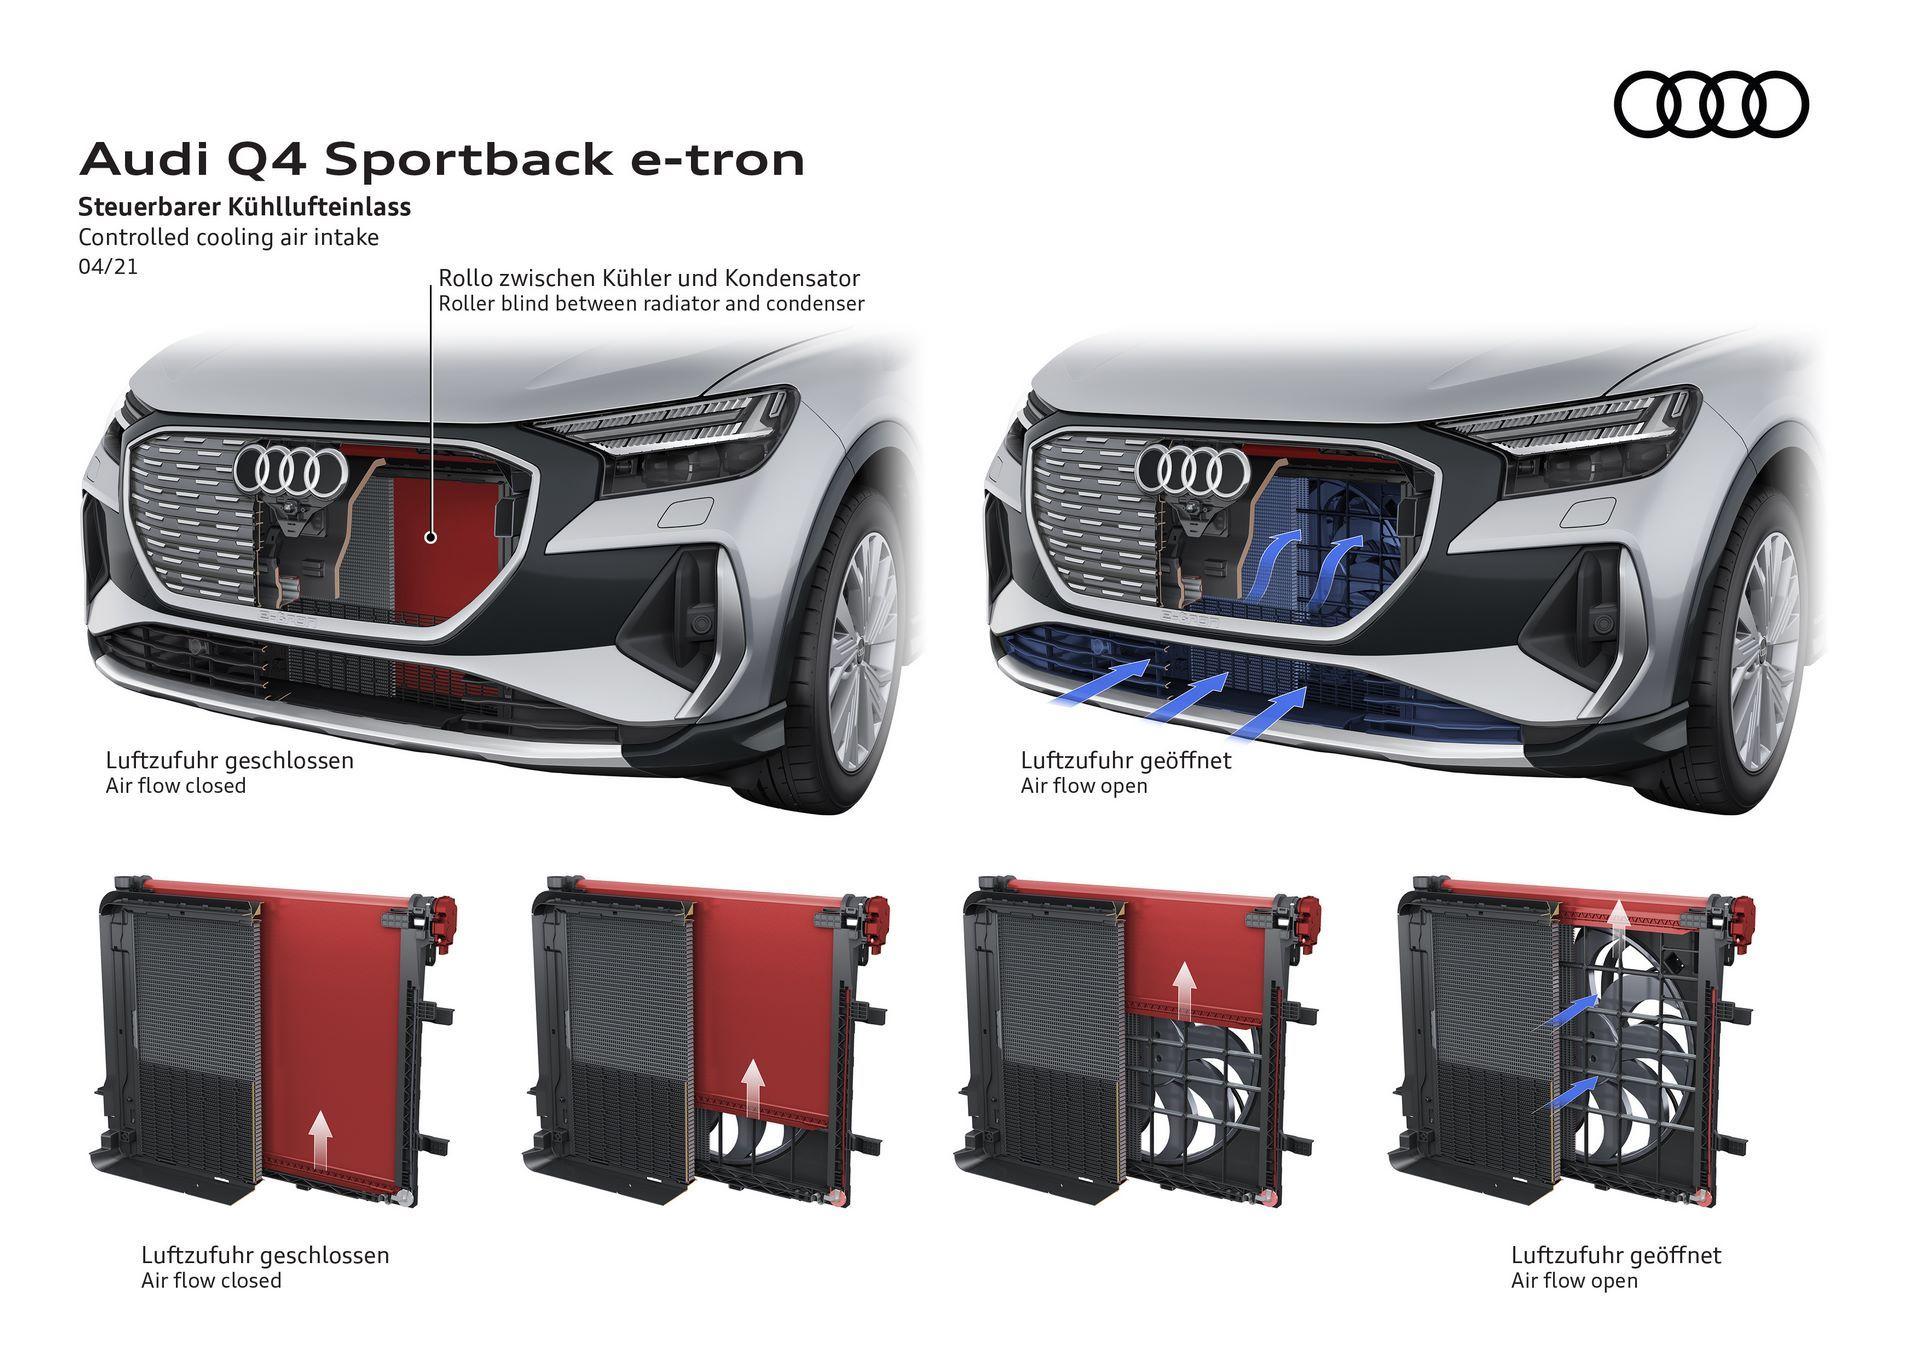 Audi-Q4-e-tron-and-Q4-e-tron-Sportback-159